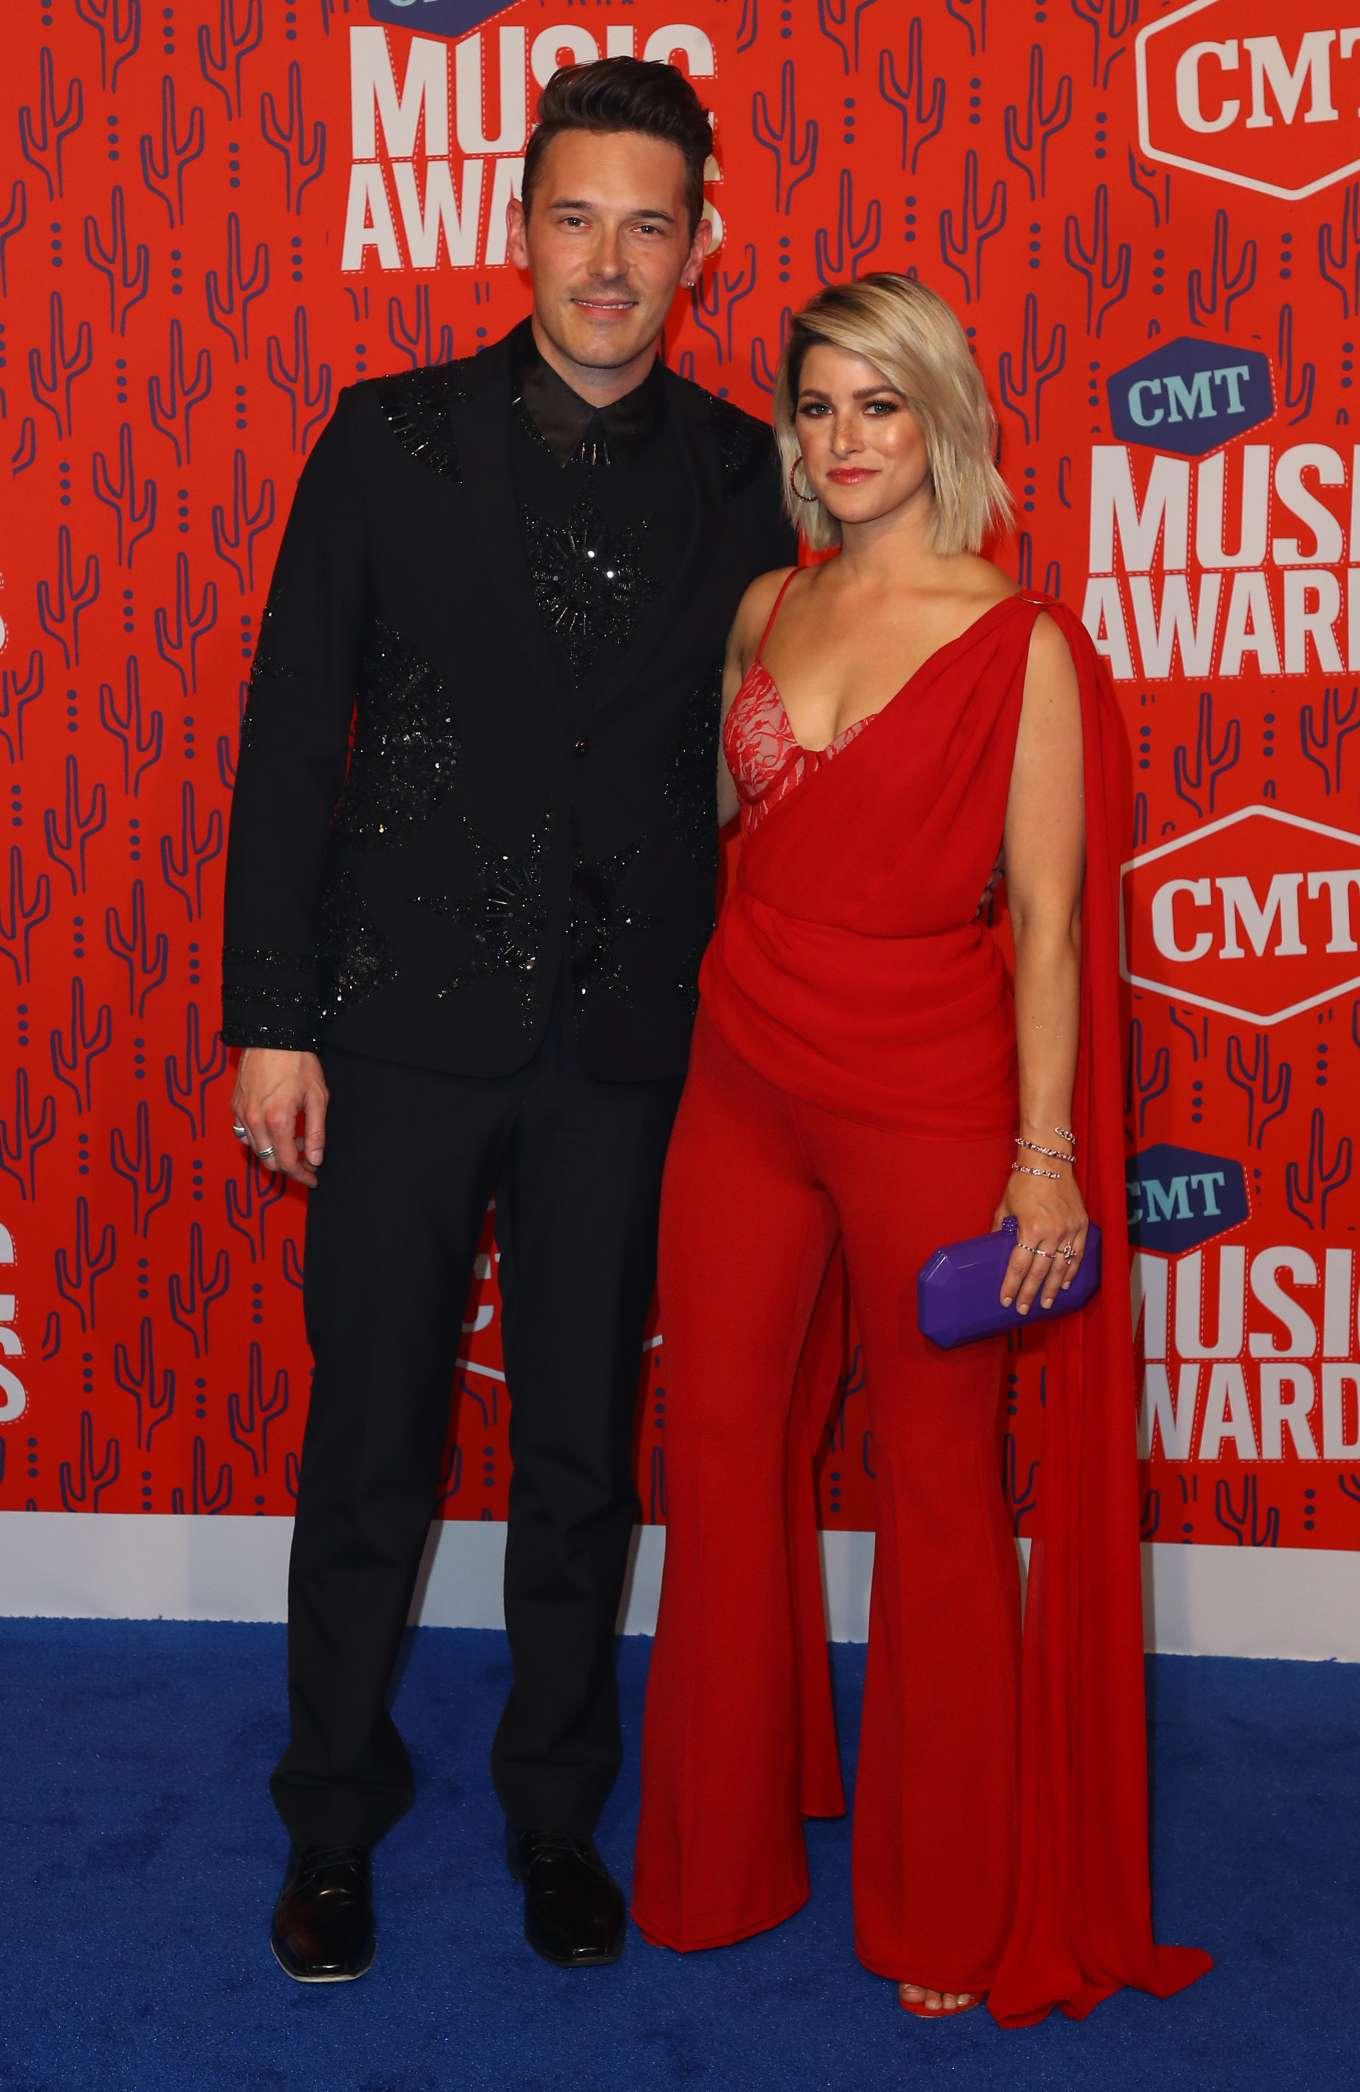 Cassadee Pope 2019 : Cassadee Pope: 2019 CMT Music Awards-24